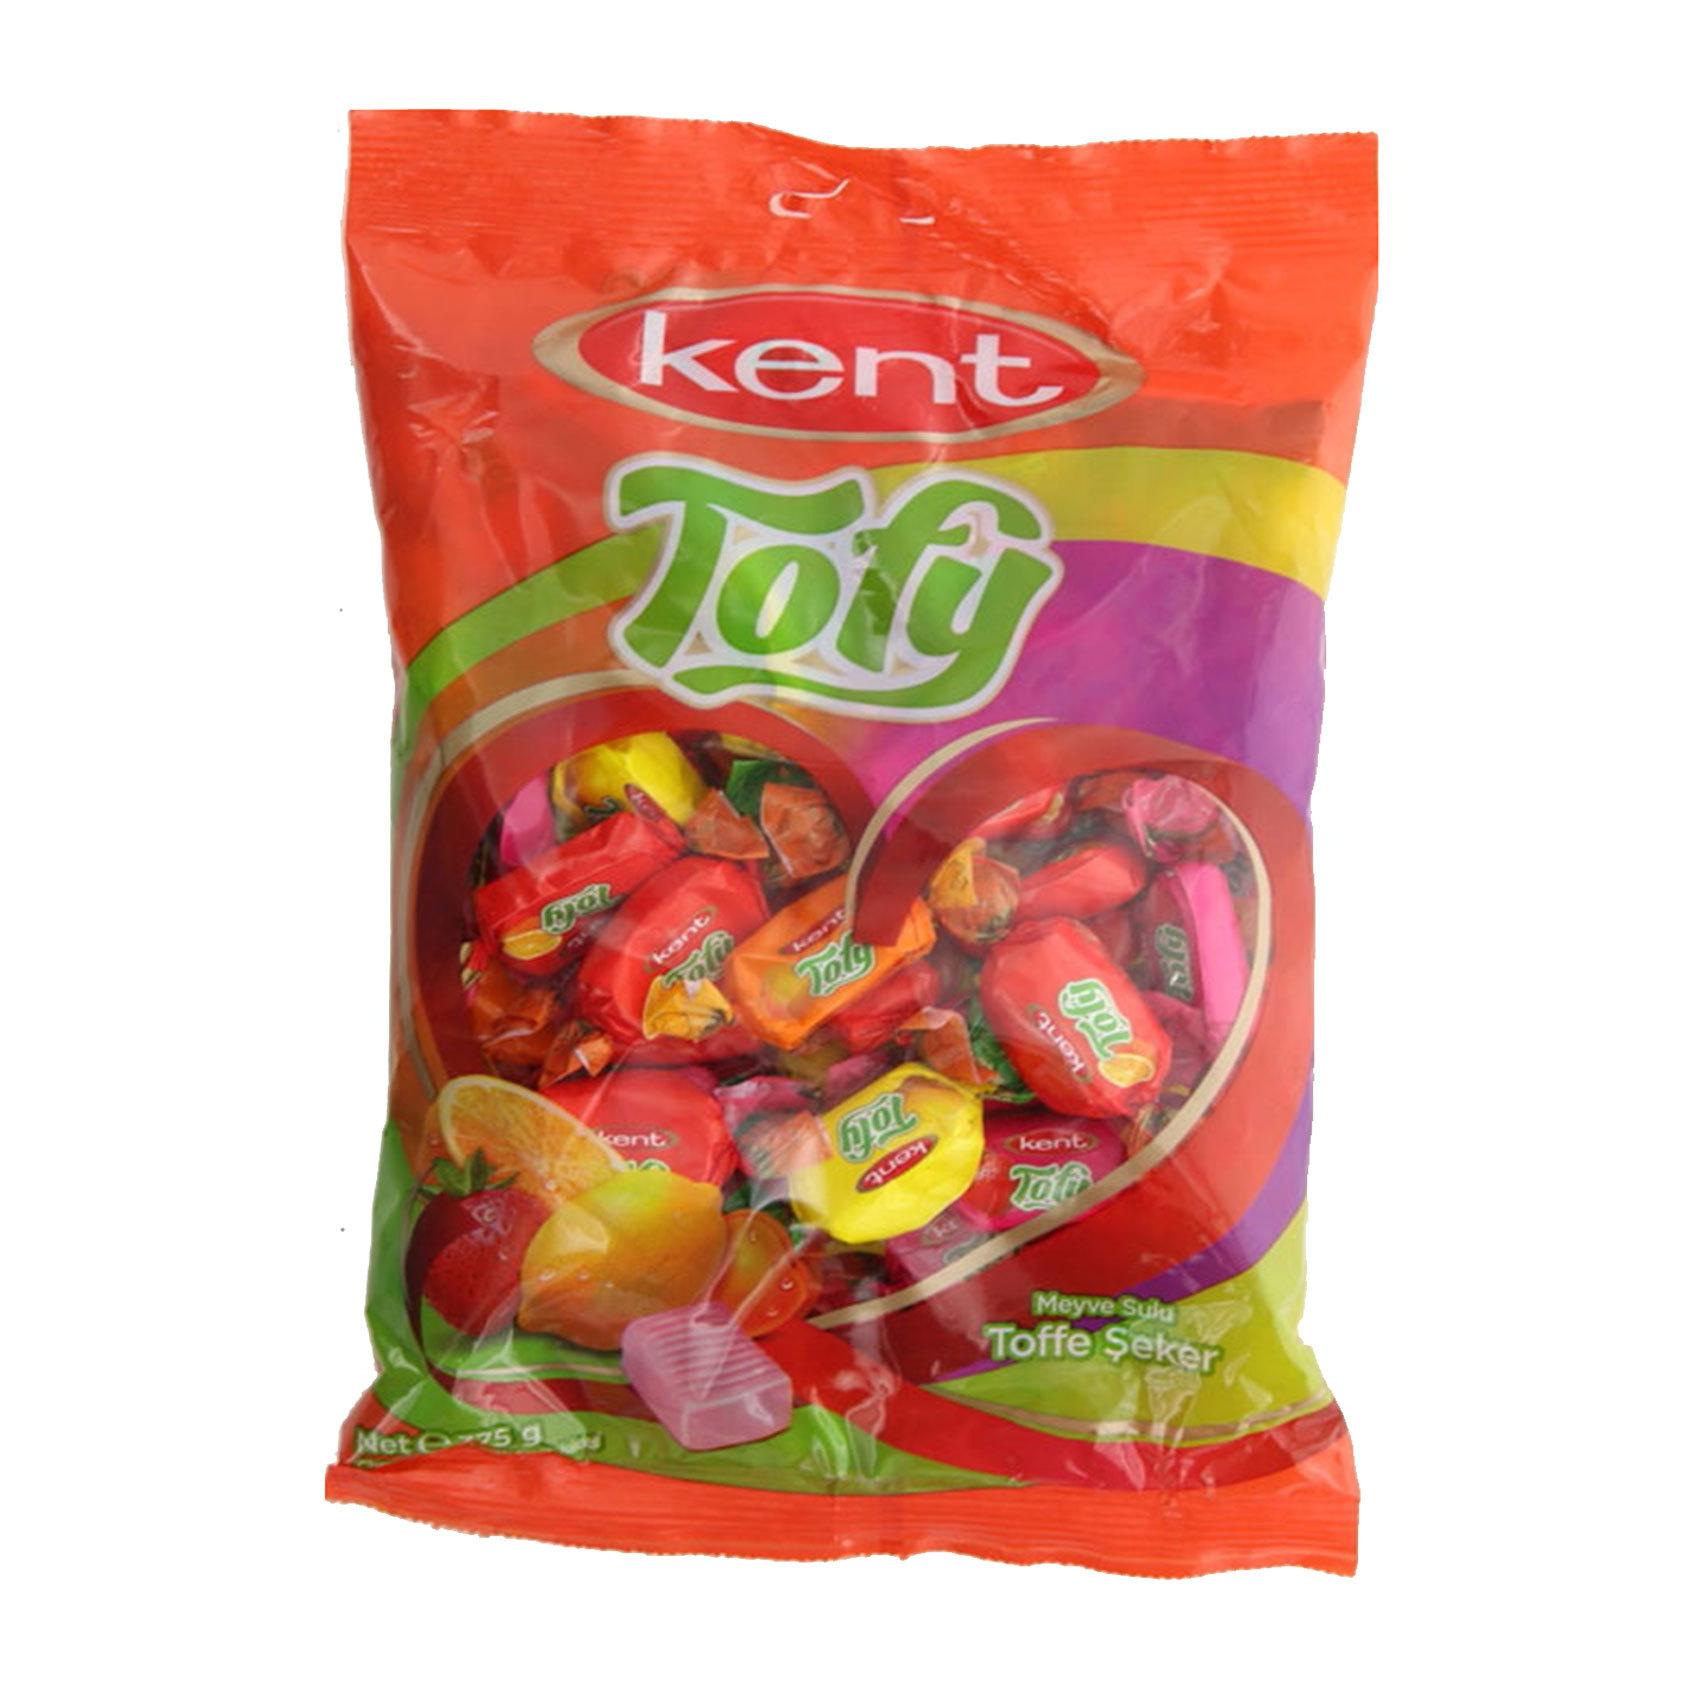 KENT MISS TOFY FRUIT CHEWS 375GR